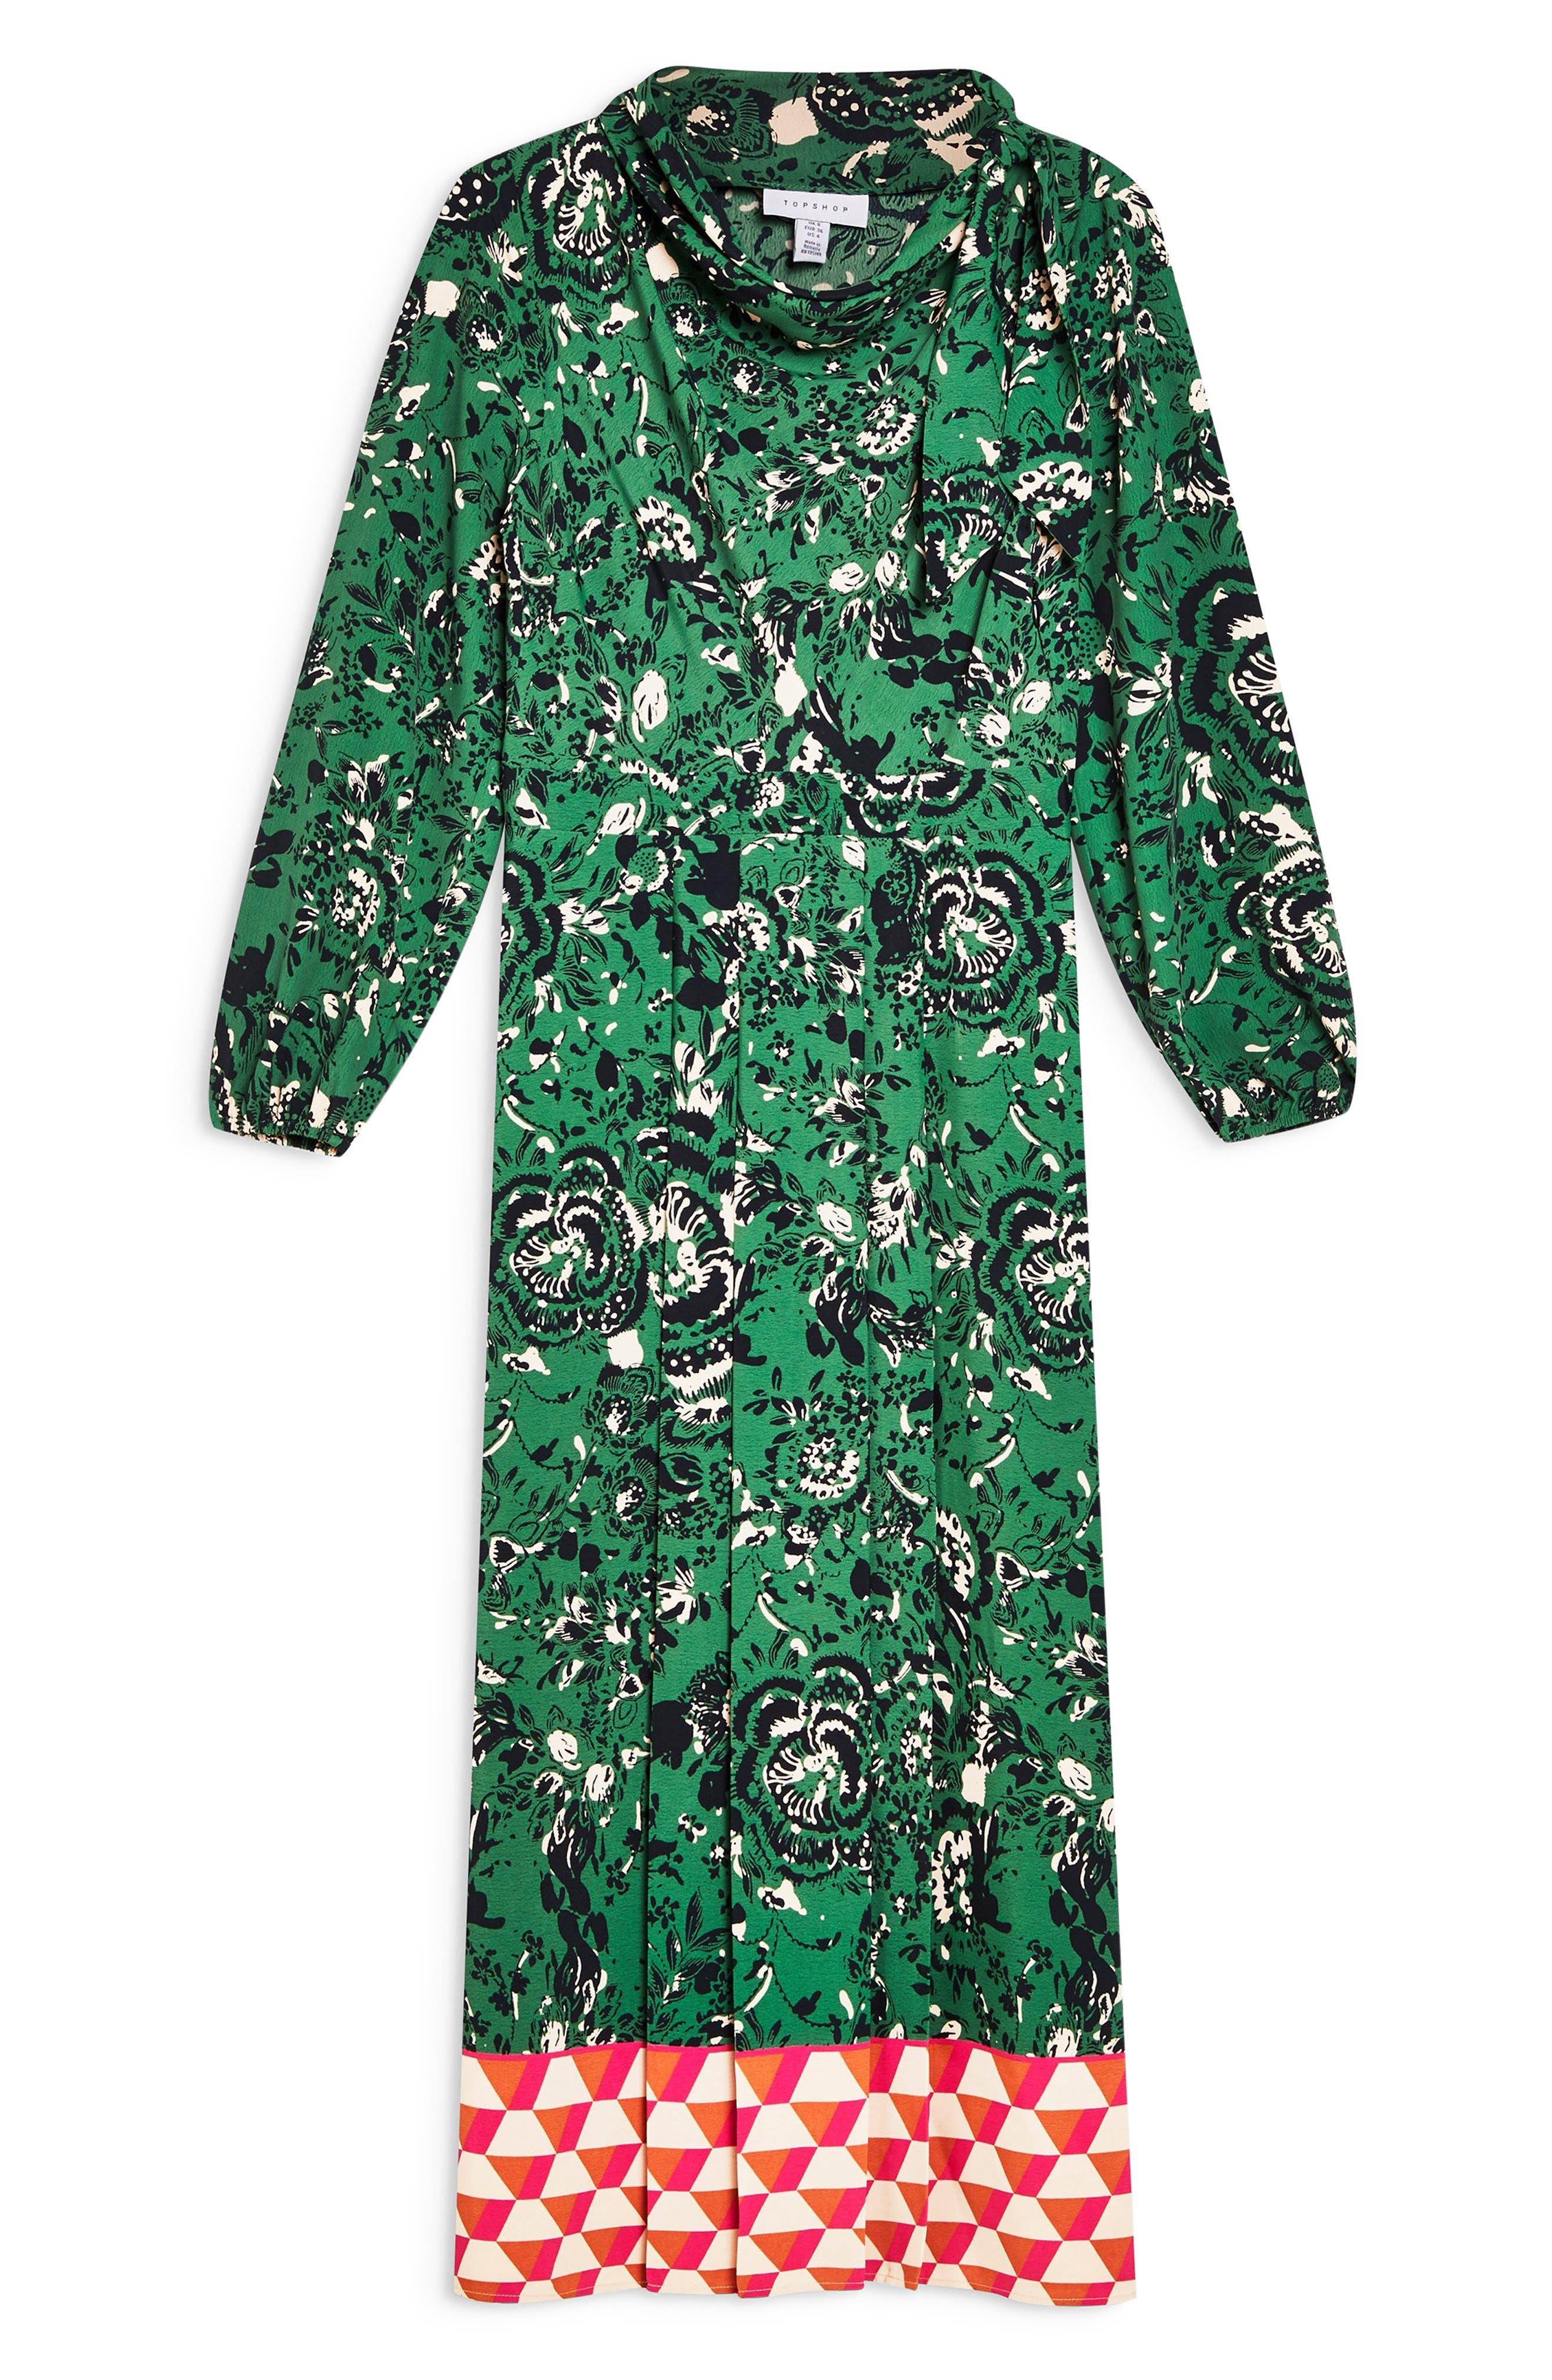 TOPSHOP, Geo Border Tie Neck Midi Dress, Alternate thumbnail 5, color, GREEN MULTI